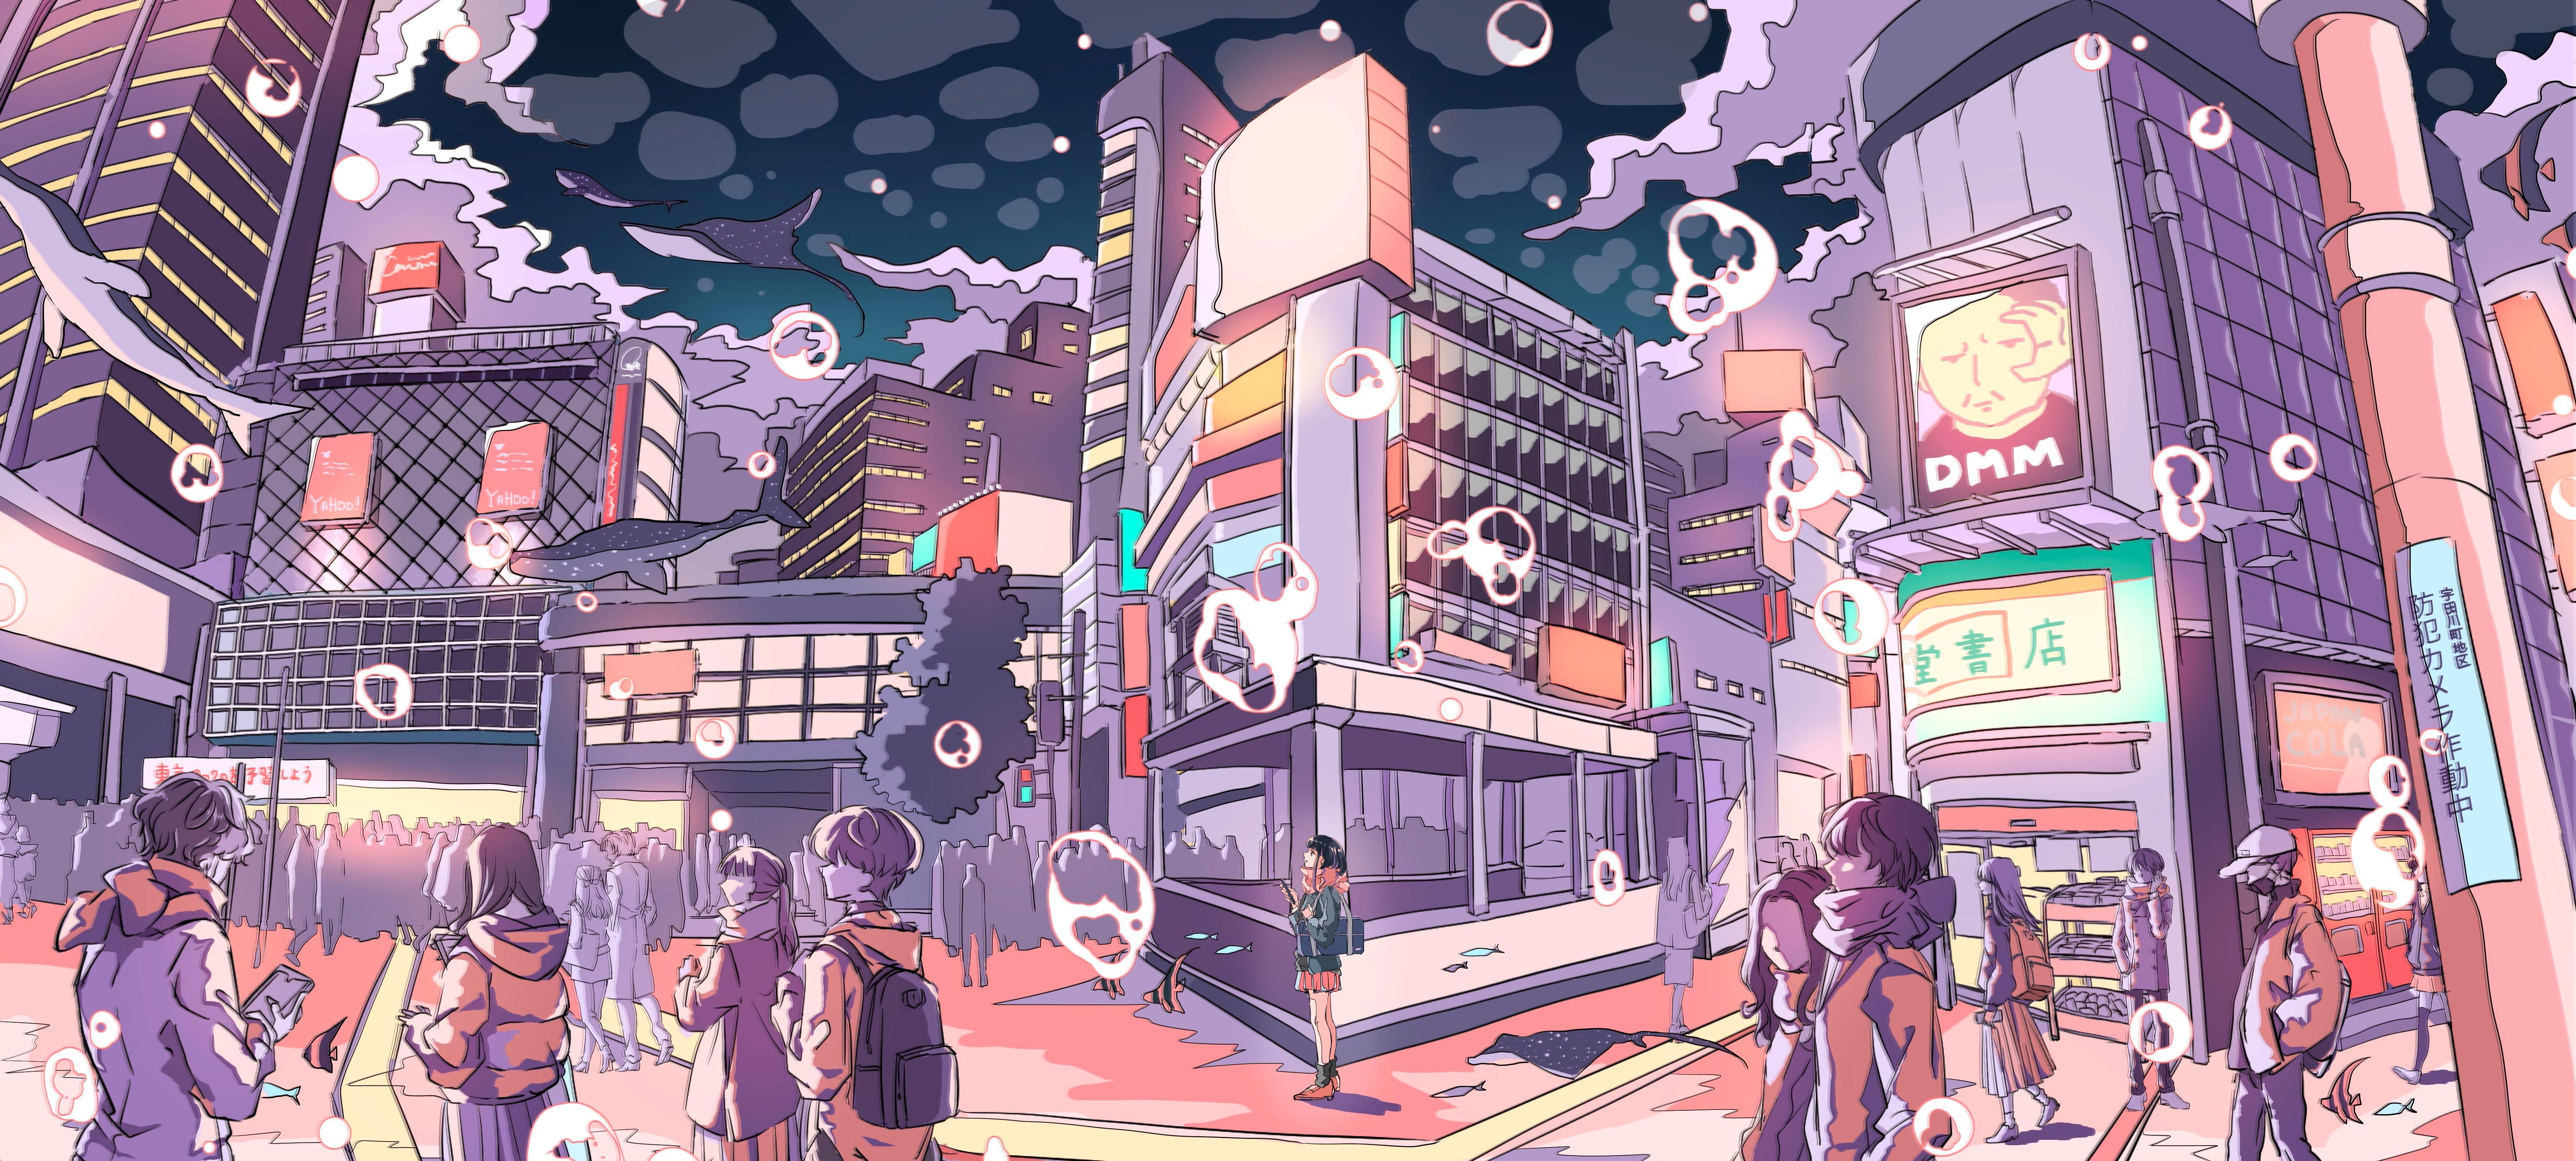 Pixiv日本画师いちご飴插画作品插图6